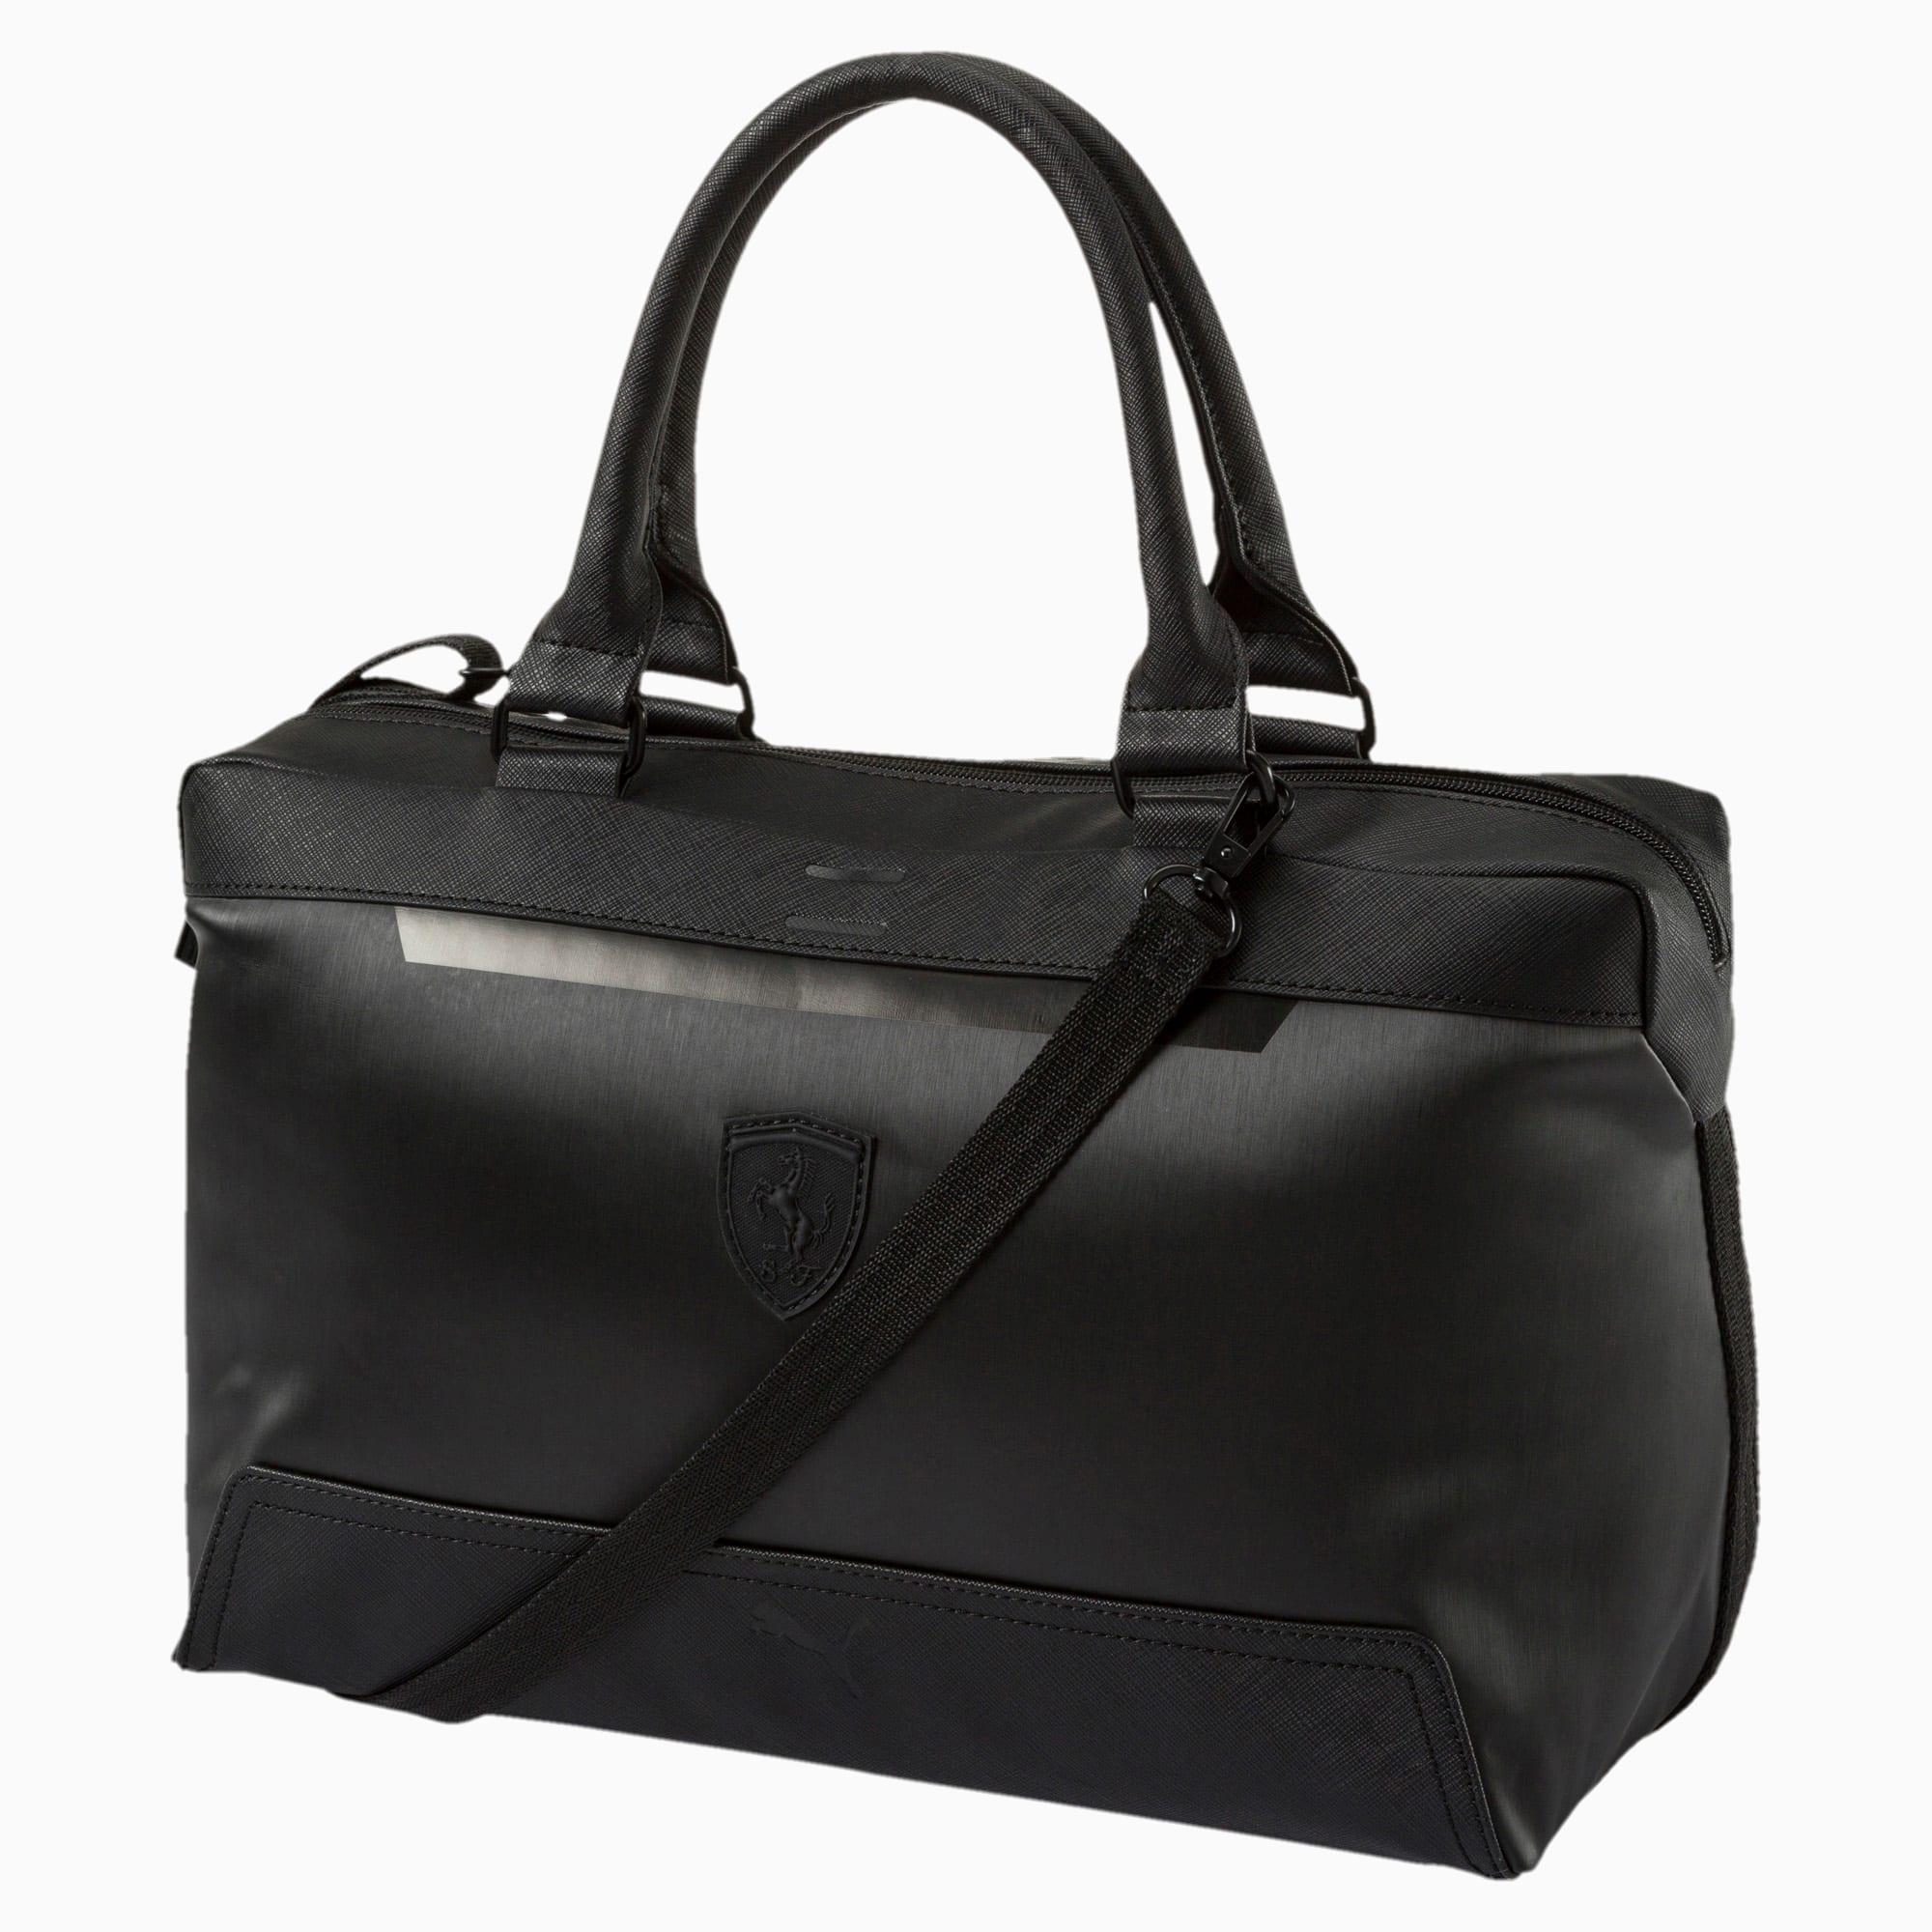 Image of PUMA Ferrari Damen Handtasche | Mit Aucun | Schwarz